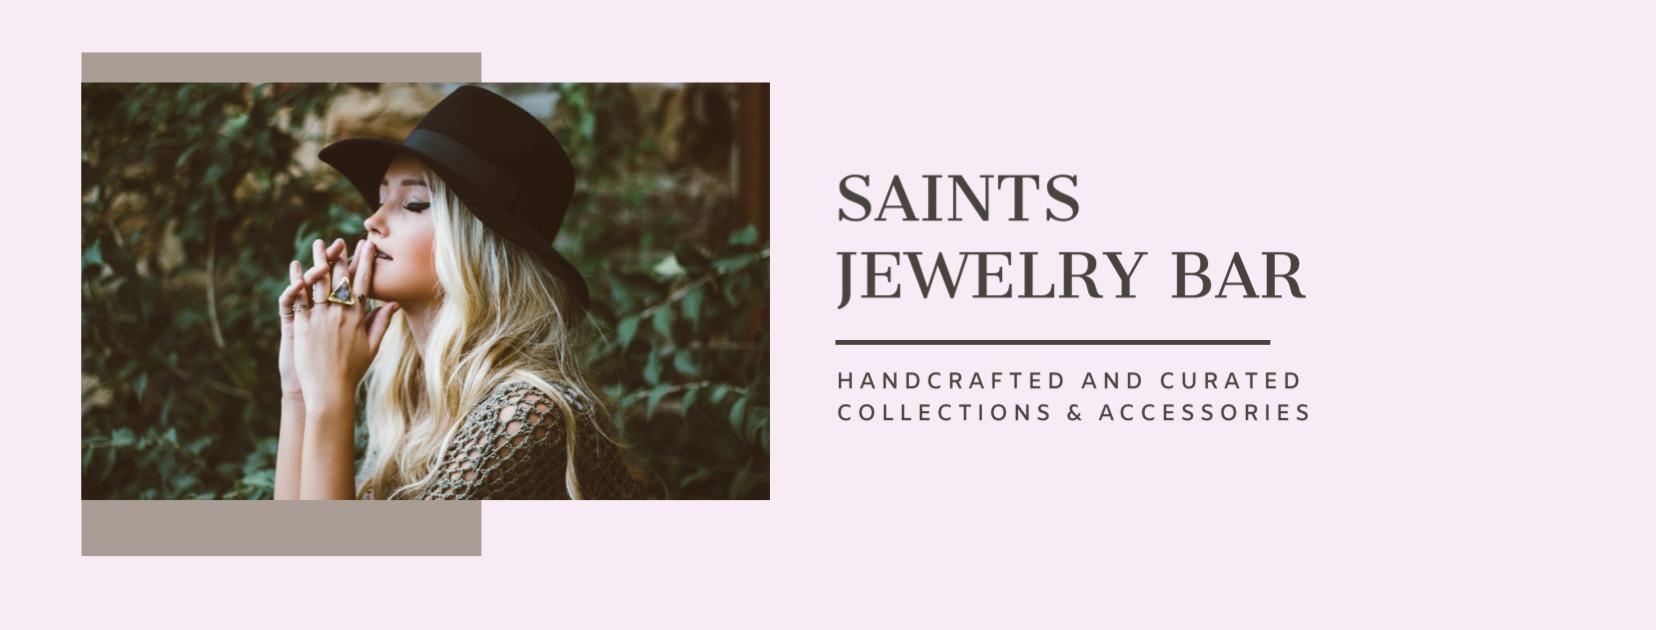 Saints Jewelry Bar (@saintsjewelrybarus) Cover Image